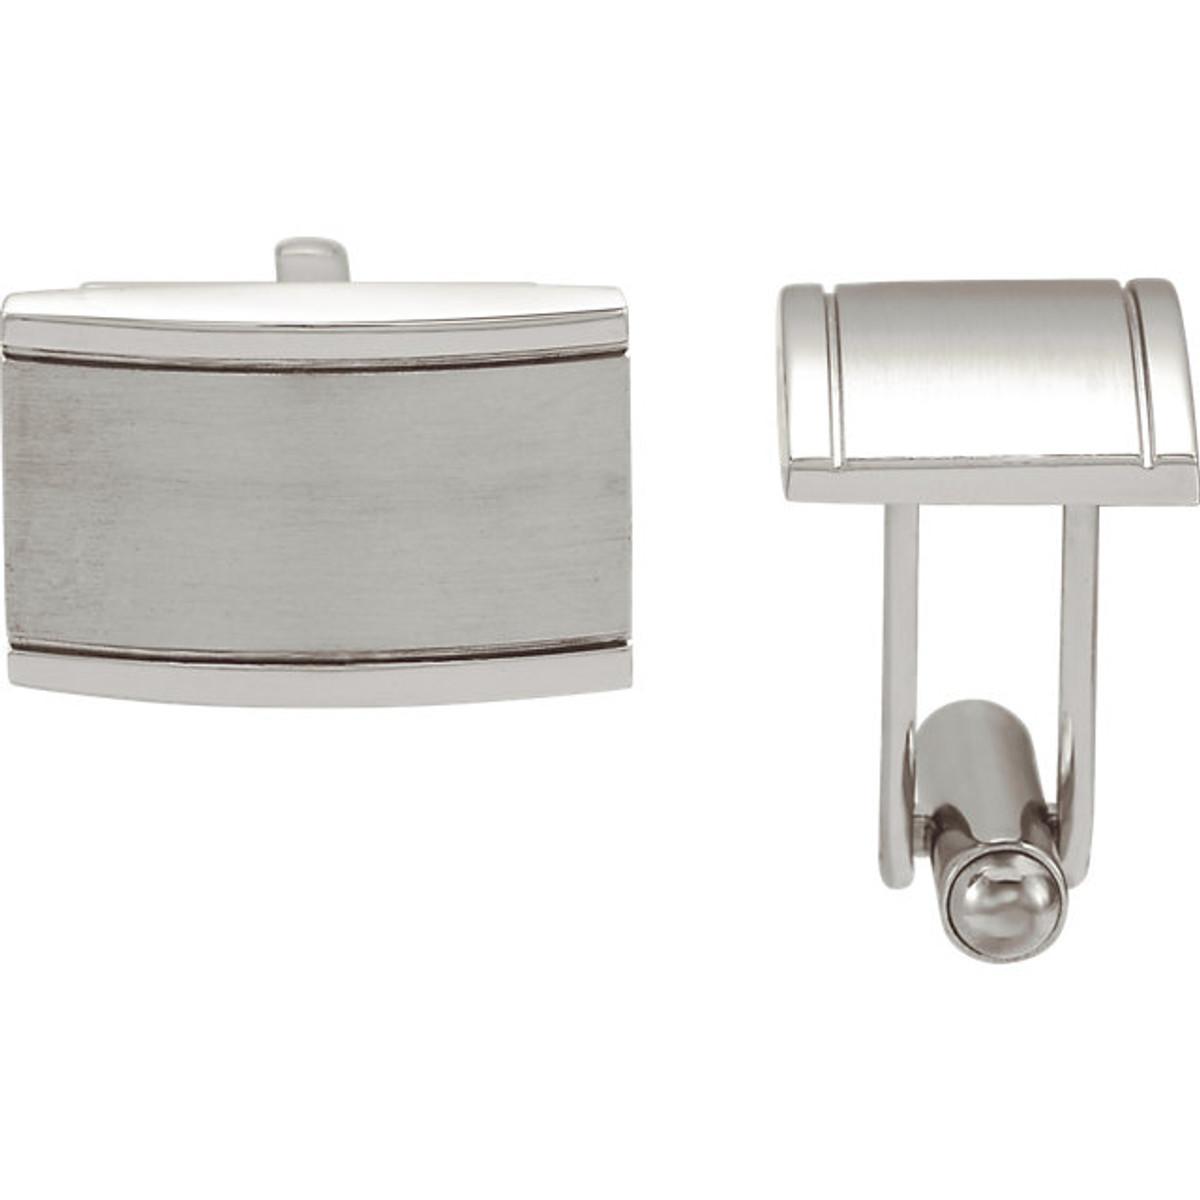 Stainless steel coqueture rectangular cuff links